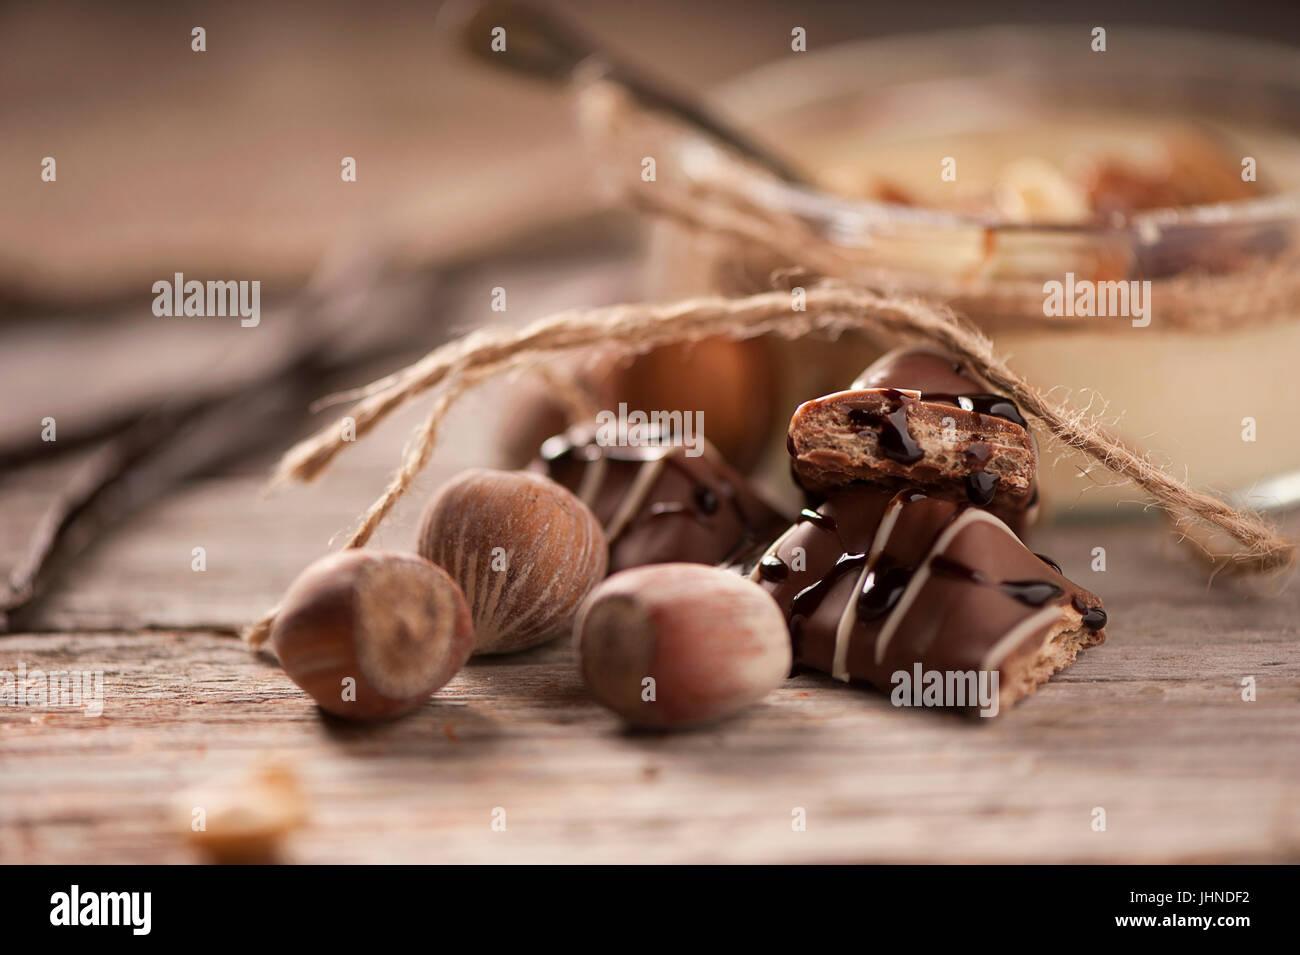 chocolate hazelnuts on wooden table background - Stock Image